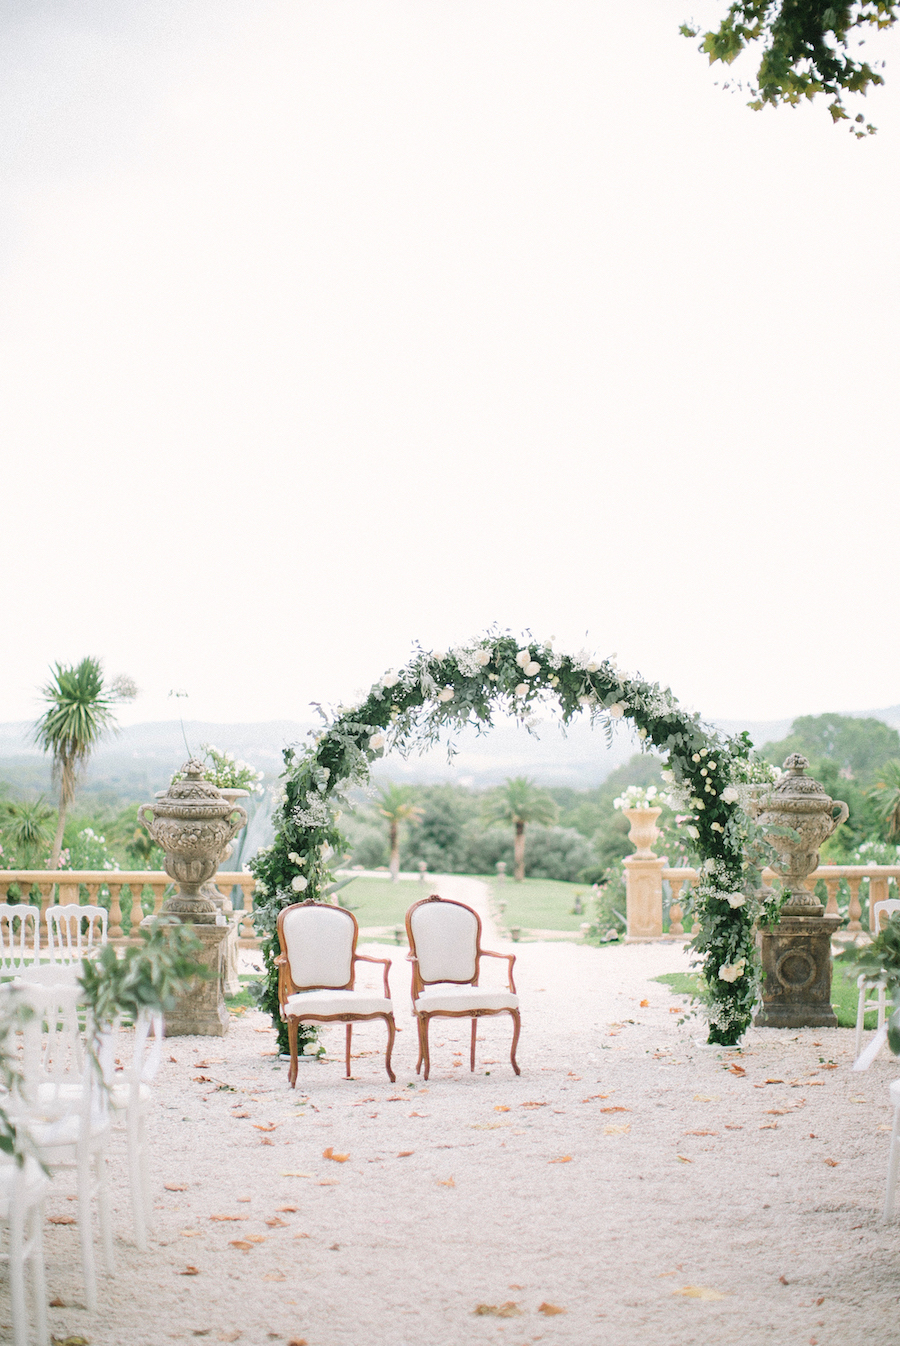 saya-photography-wedding-photographer-provence-chateau-de-robernier-36.jpg